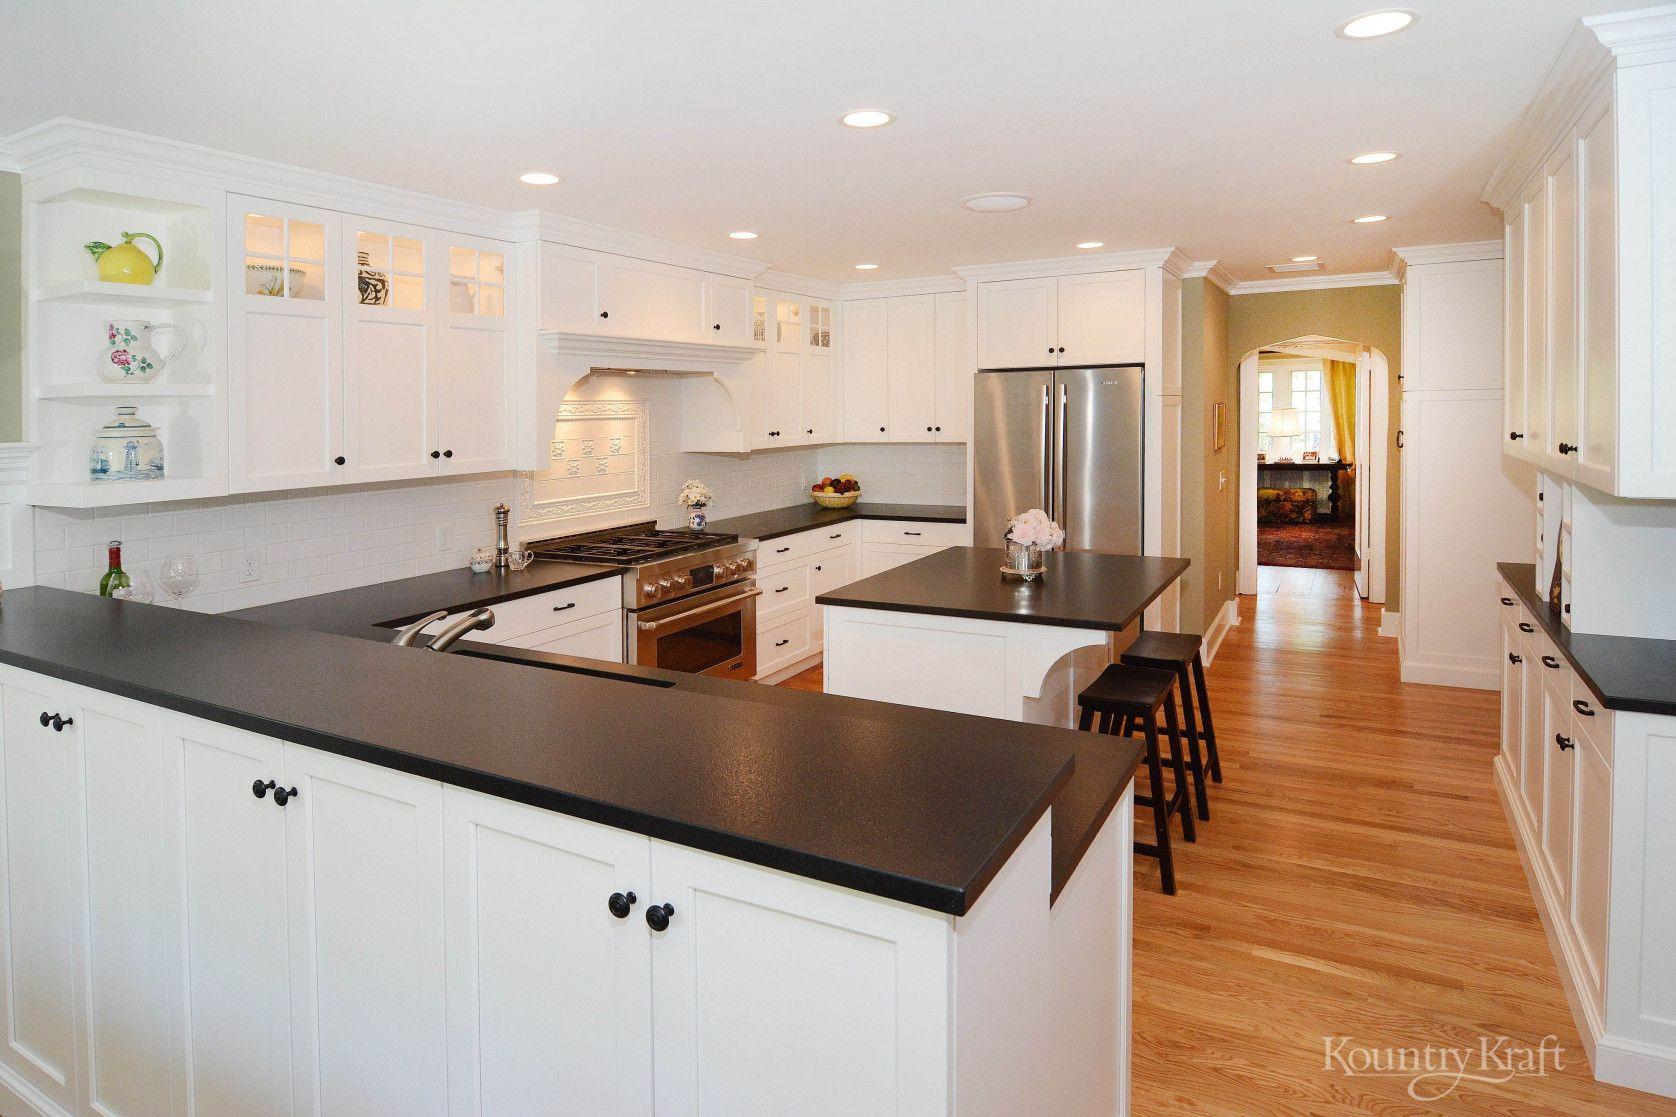 2019 Tsg Cabinets Edison Nj Kitchen Cabinet Lighting Ideas Check More At Http Custom Kitchen Cabinets Kitchen Cabinetry Design Custom Kitchen Cabinets Design